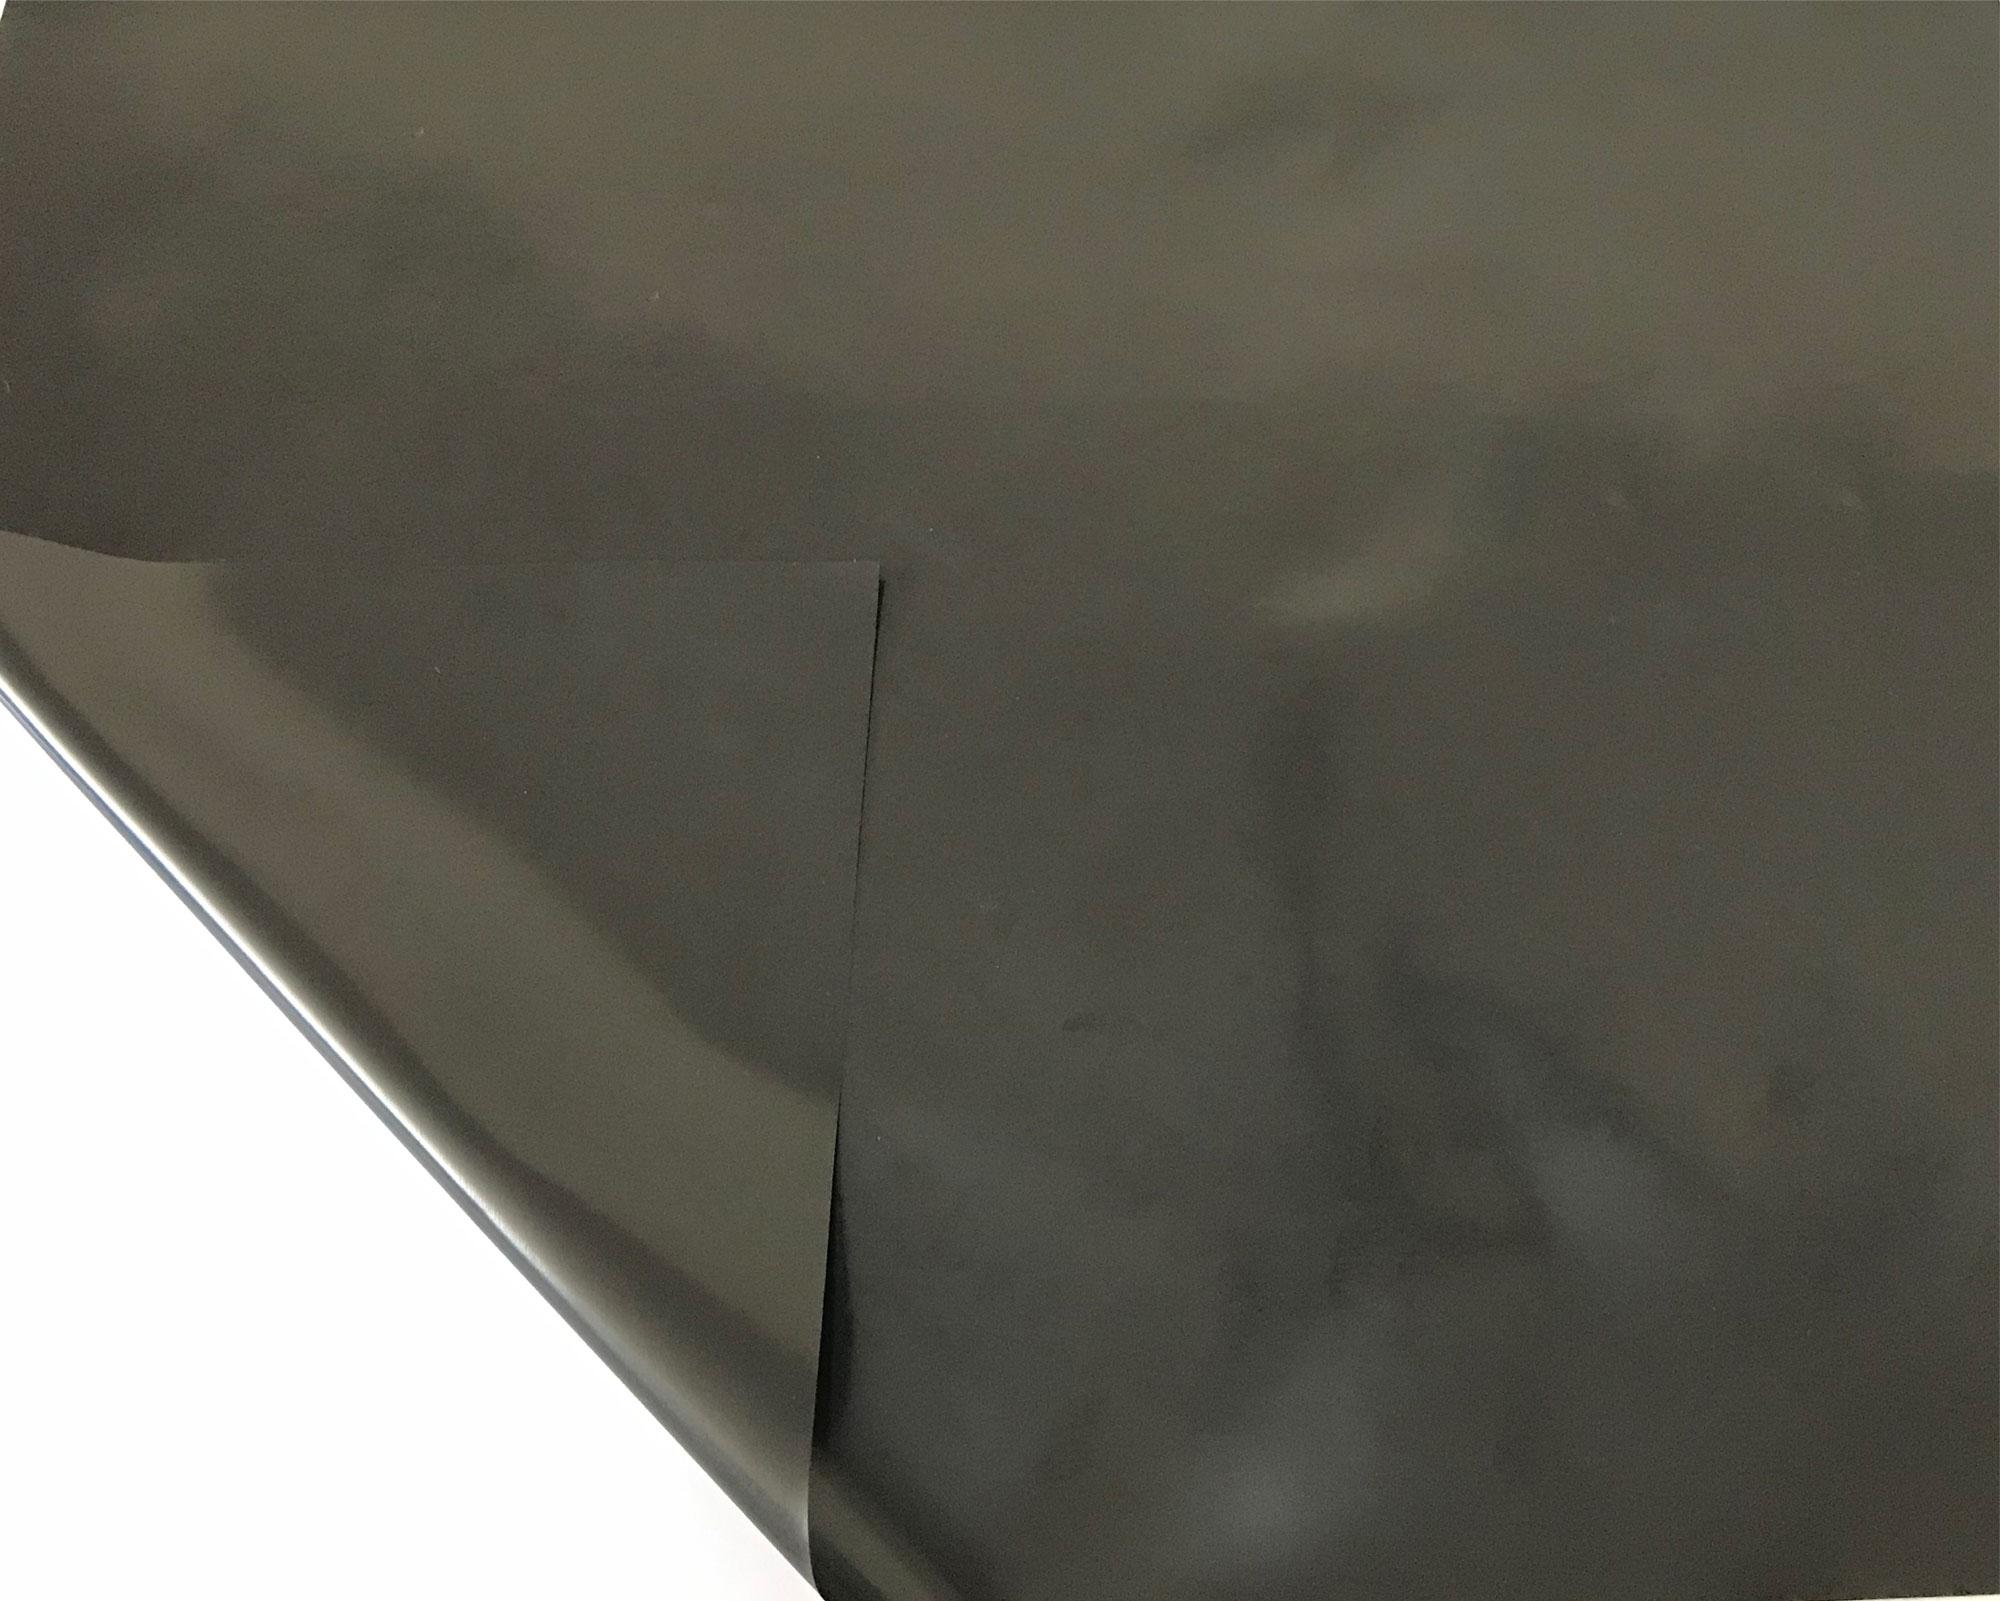 Lona Geomembrana + Manta Bidim 300 Micras - 4,5x2,5